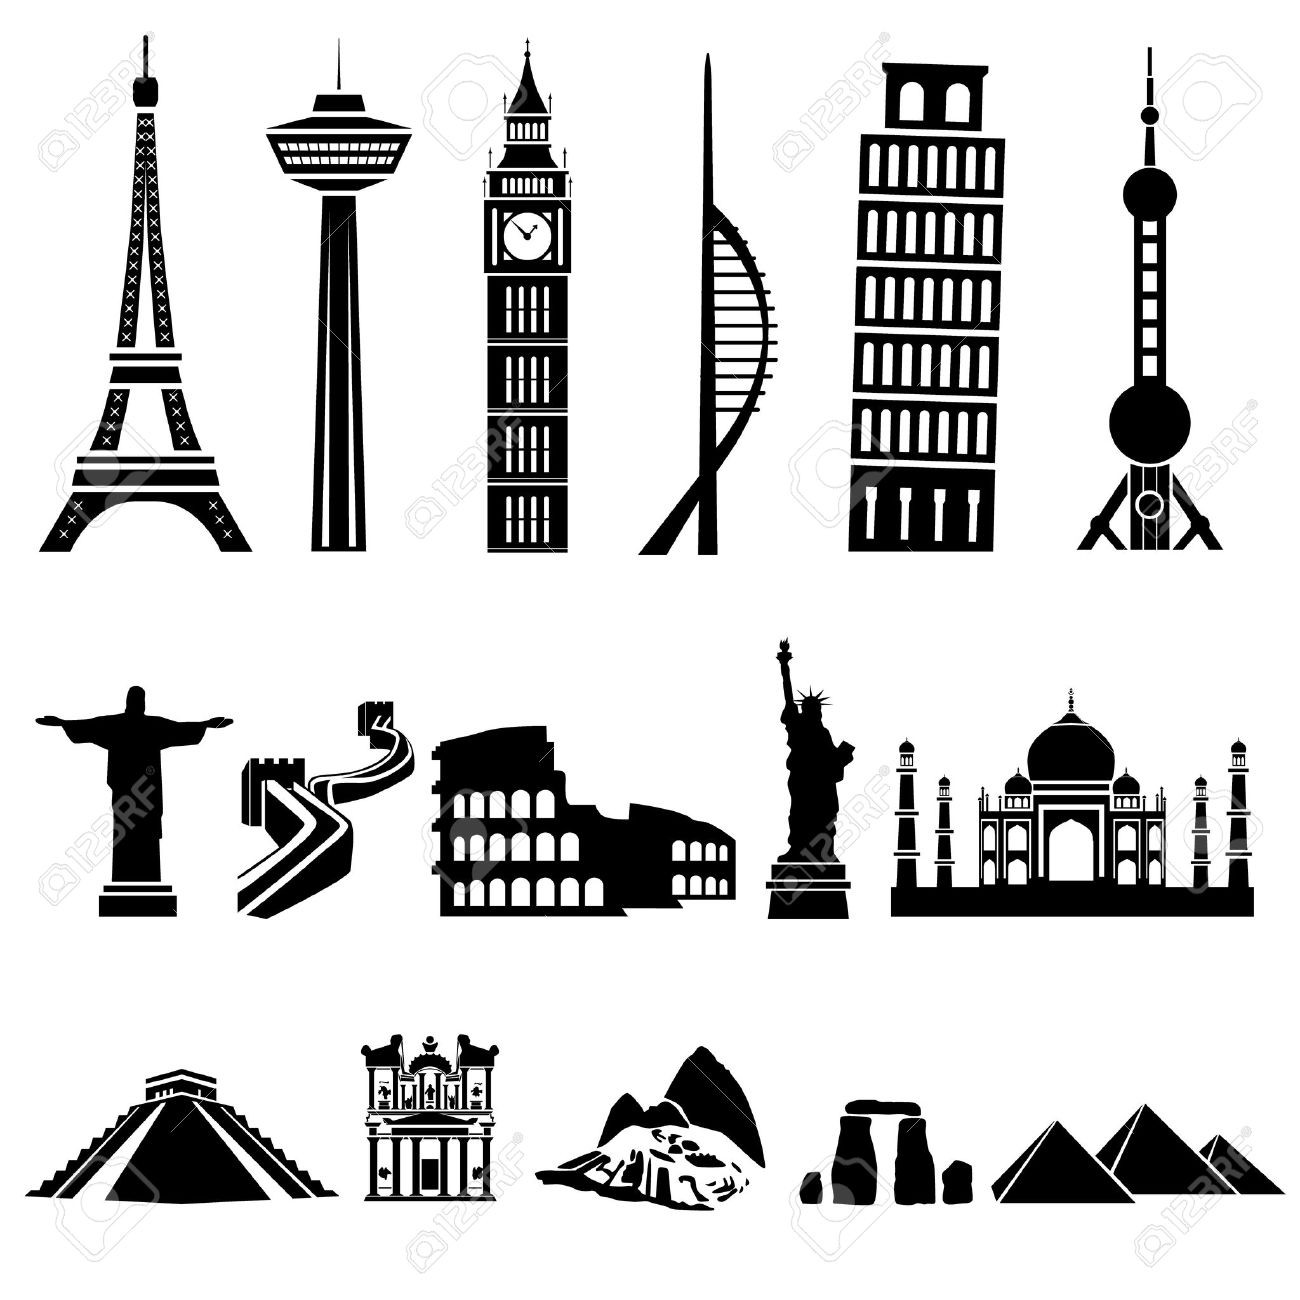 world buildings - 26202683